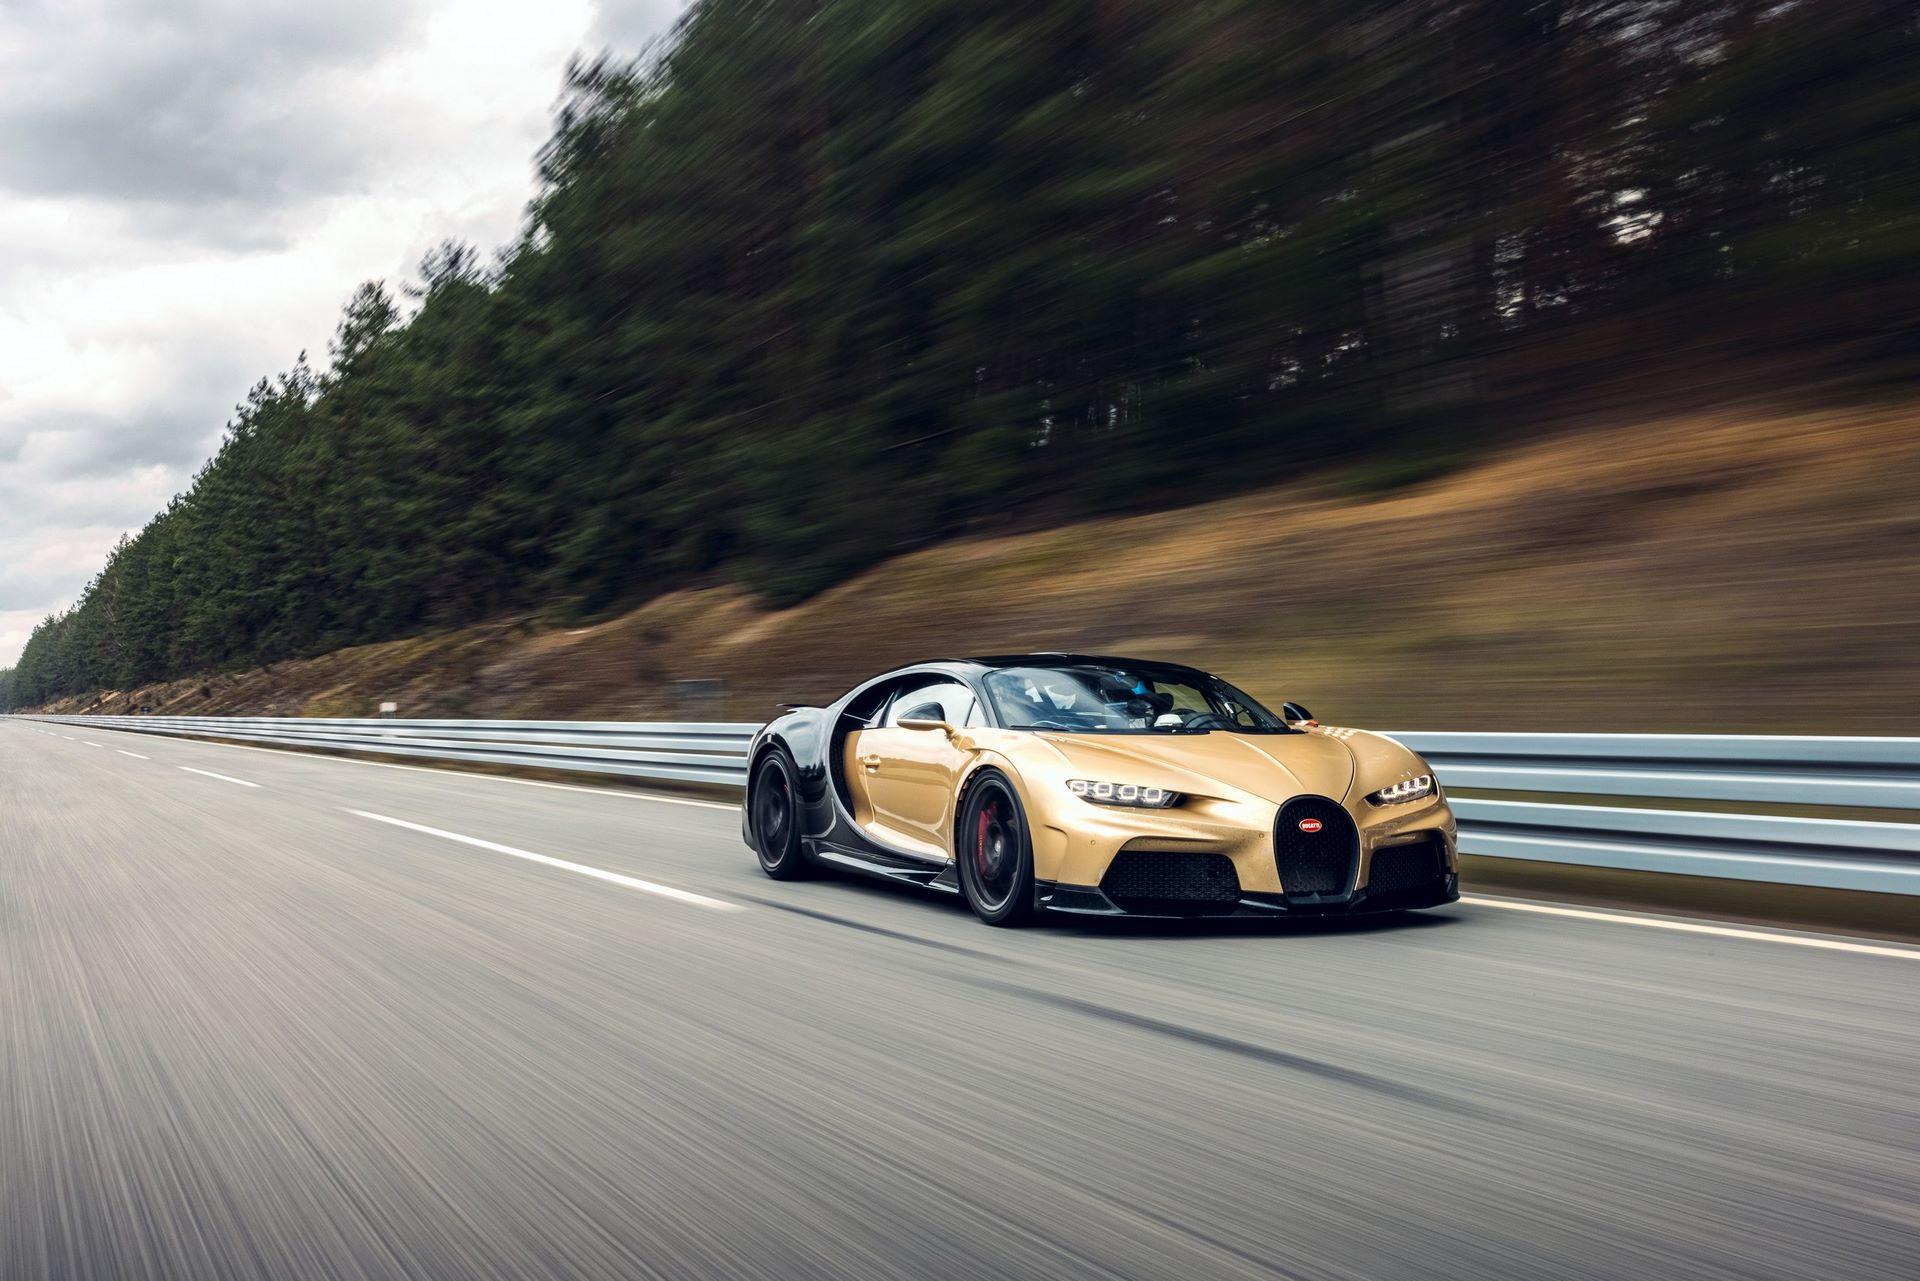 Bugatti-Chiron-Super-Sport-testing-1